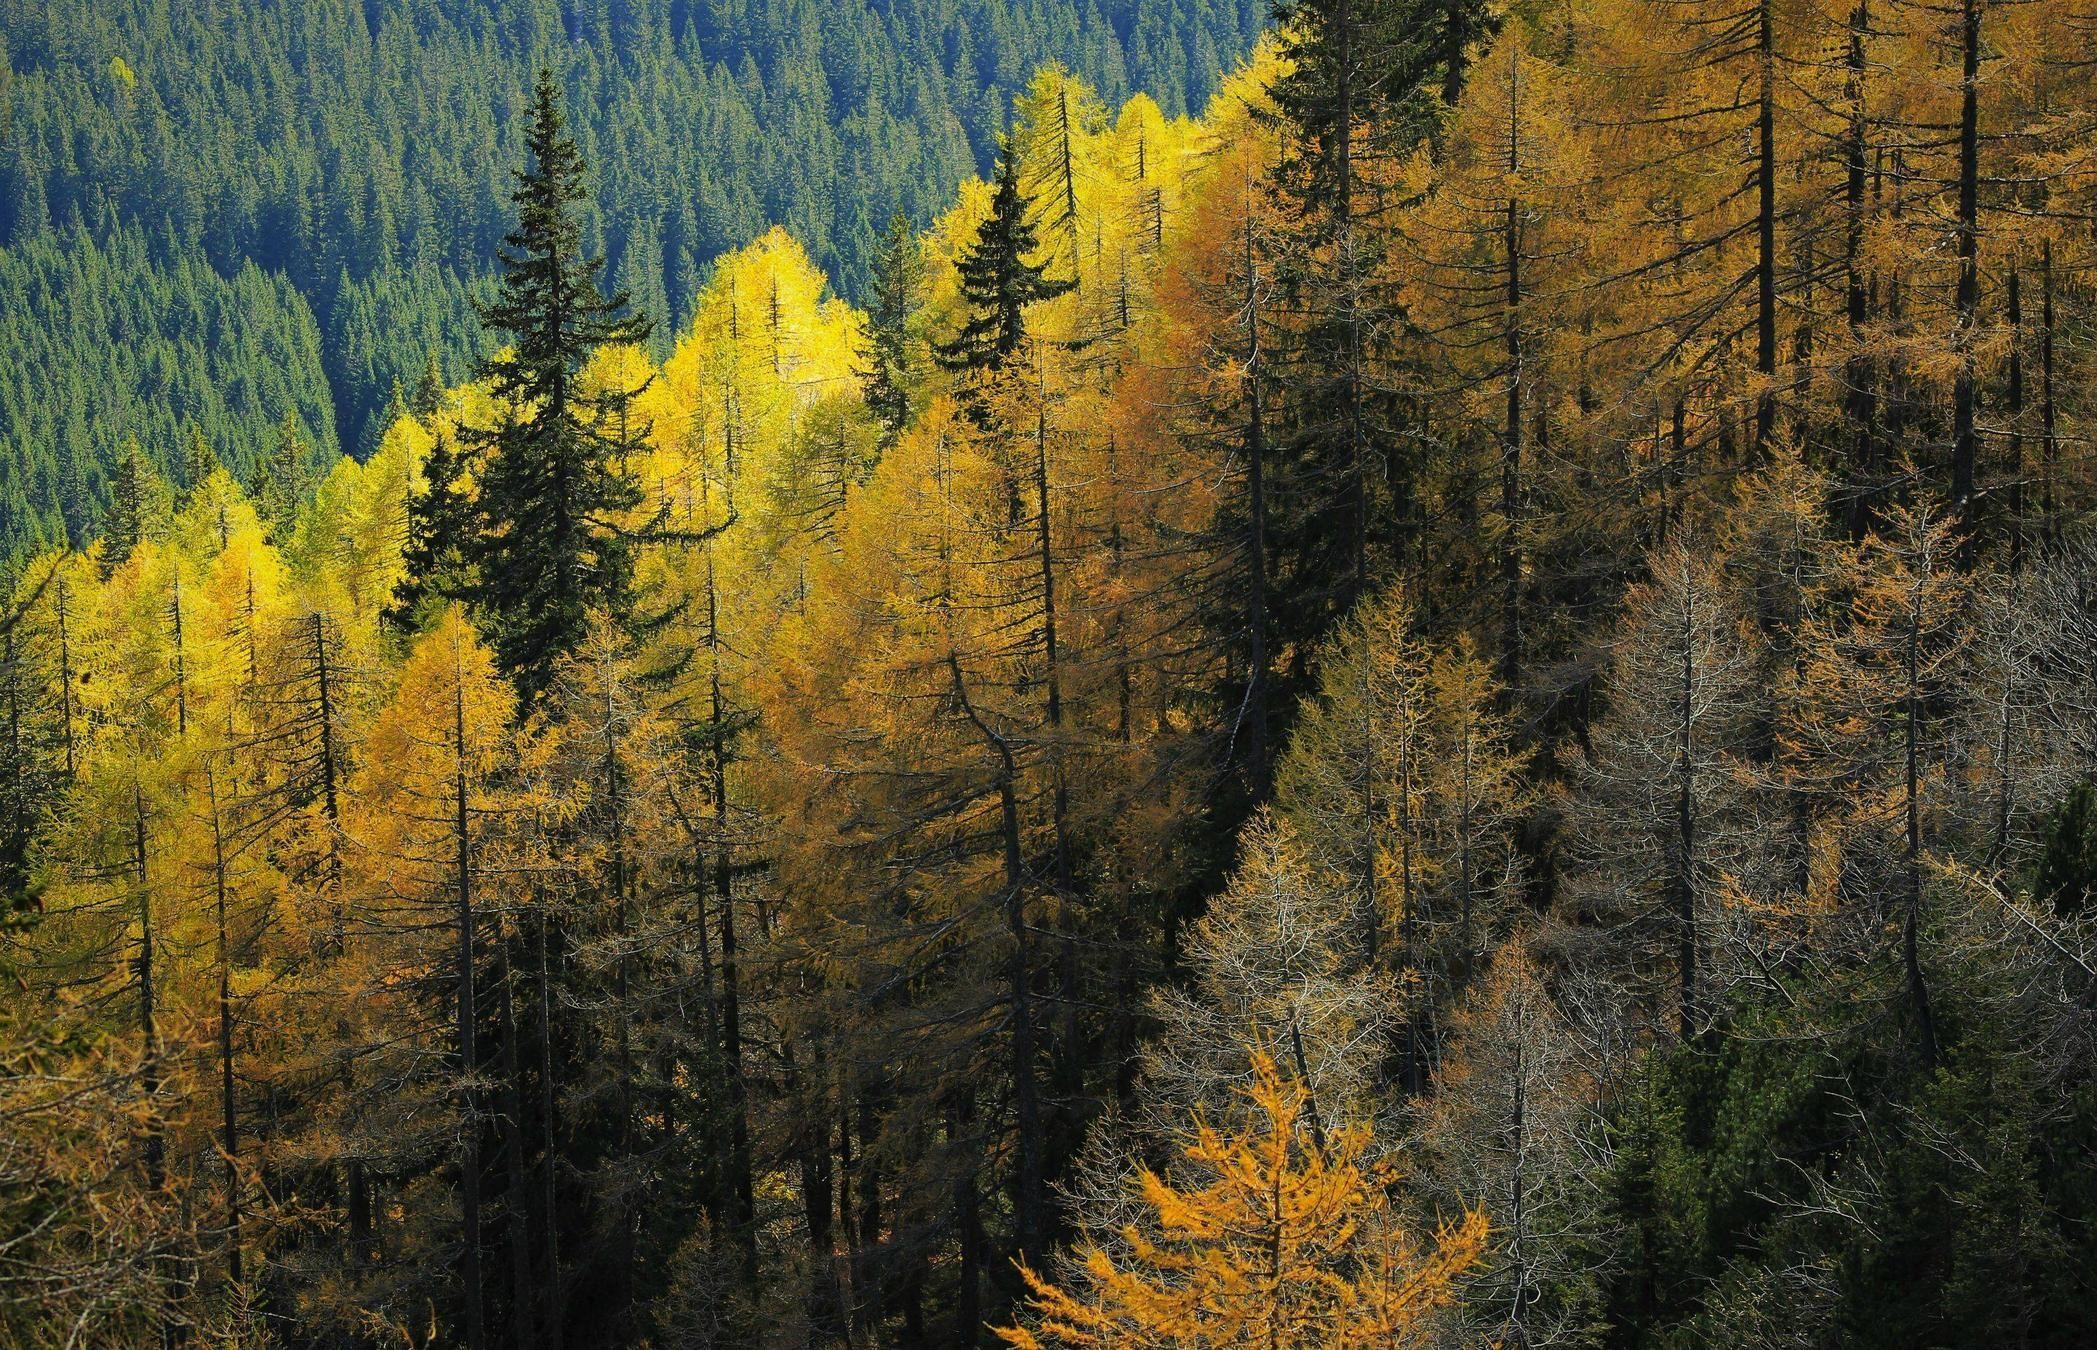 Autumn colours in coniferous forest of Pokljuka Julian Alps [OC] [2097x1350]